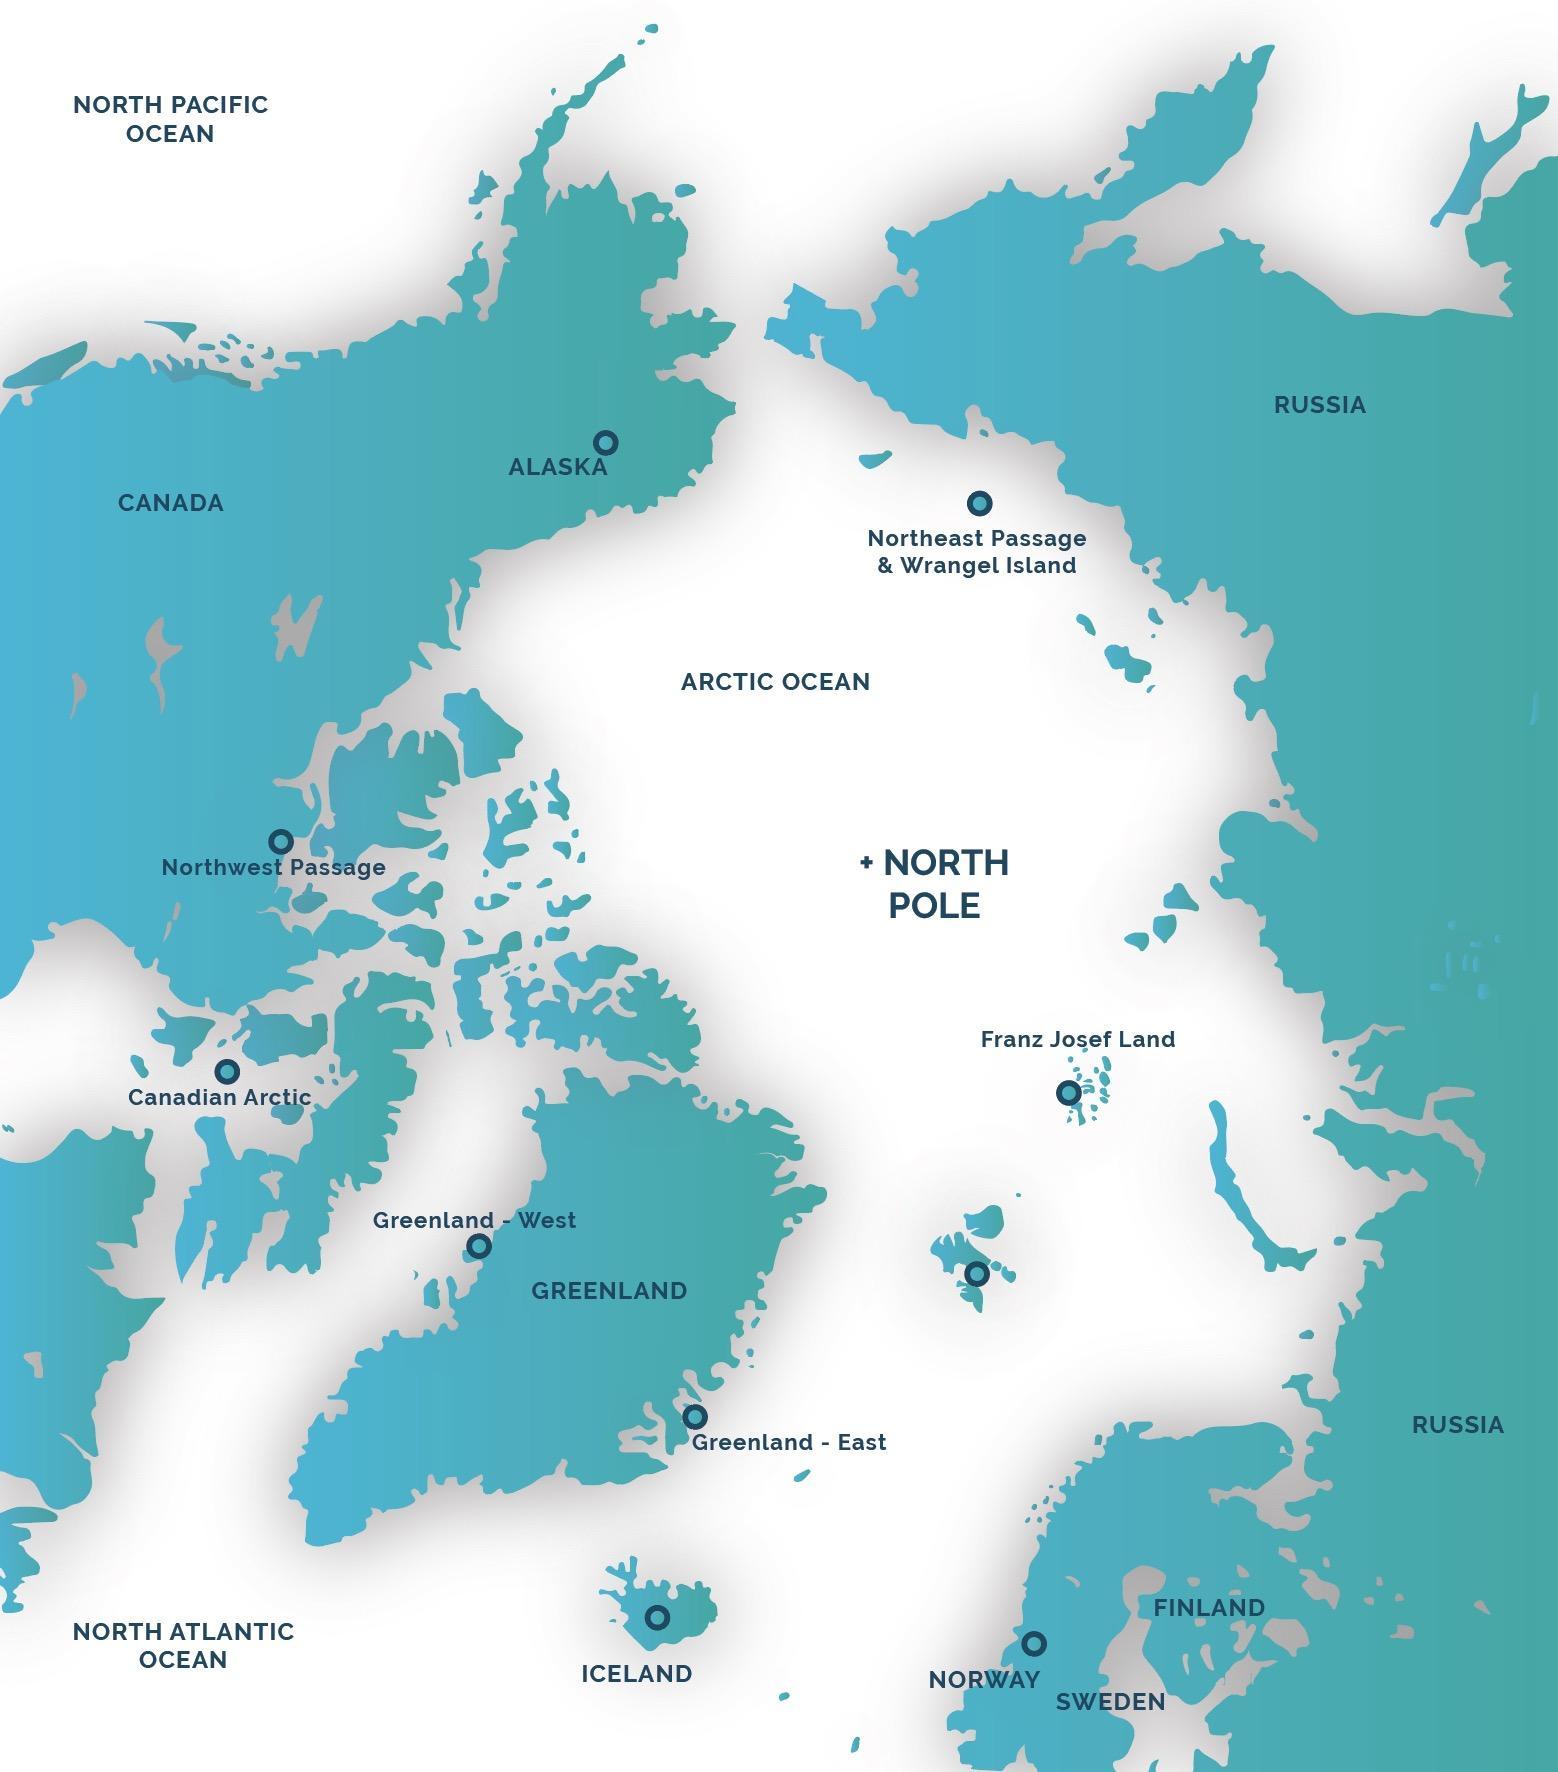 Canadian arctc